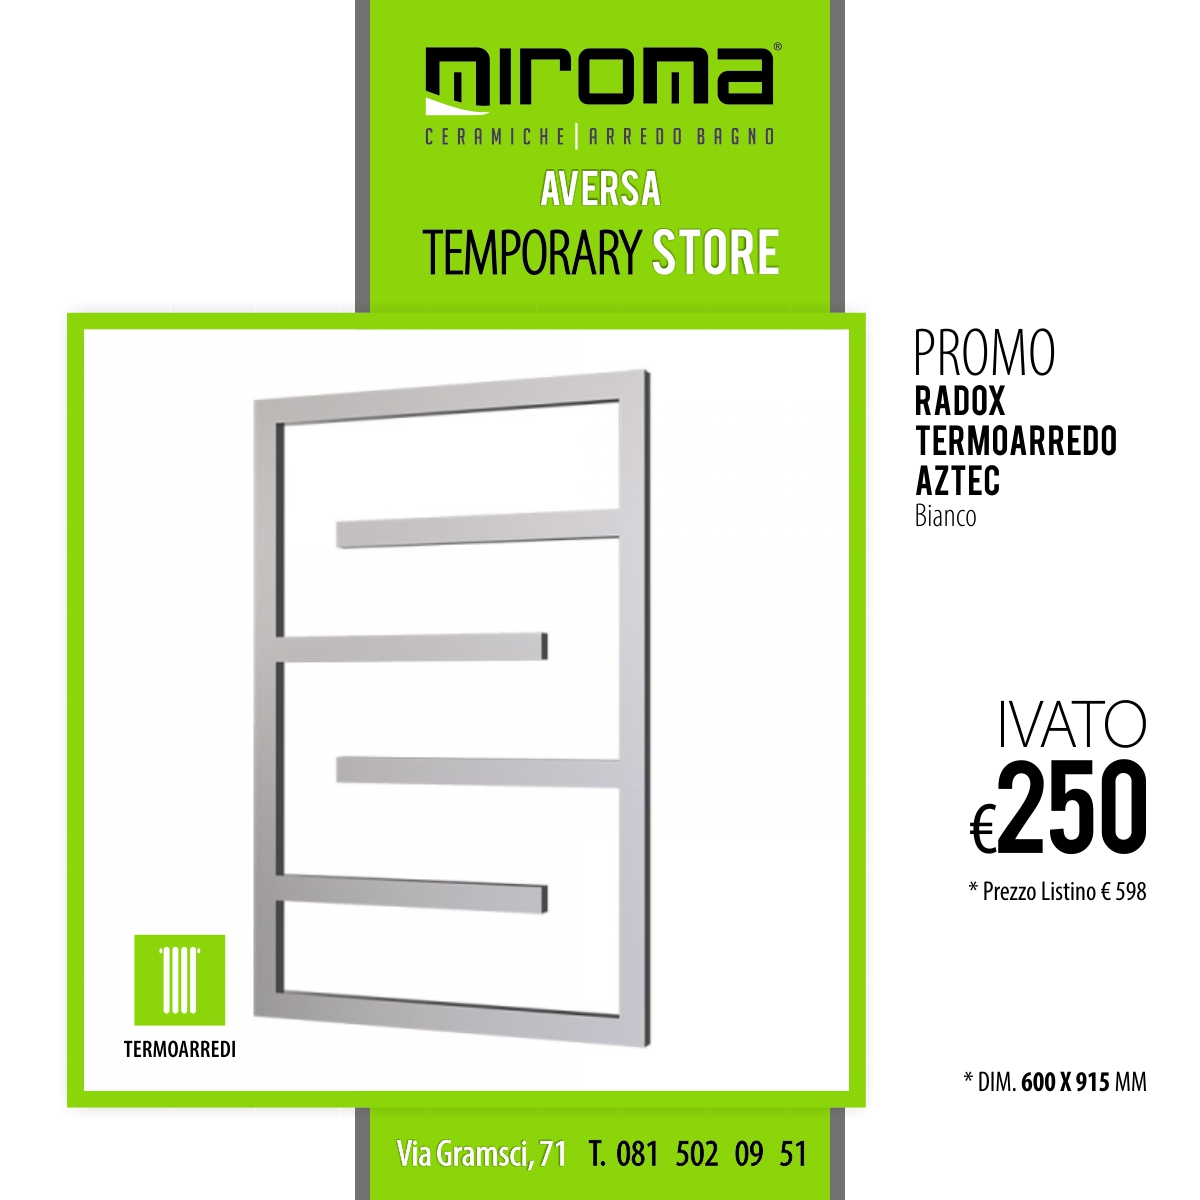 RADOX-TERMOARREDO-AZTEC-600X915-BIANCO